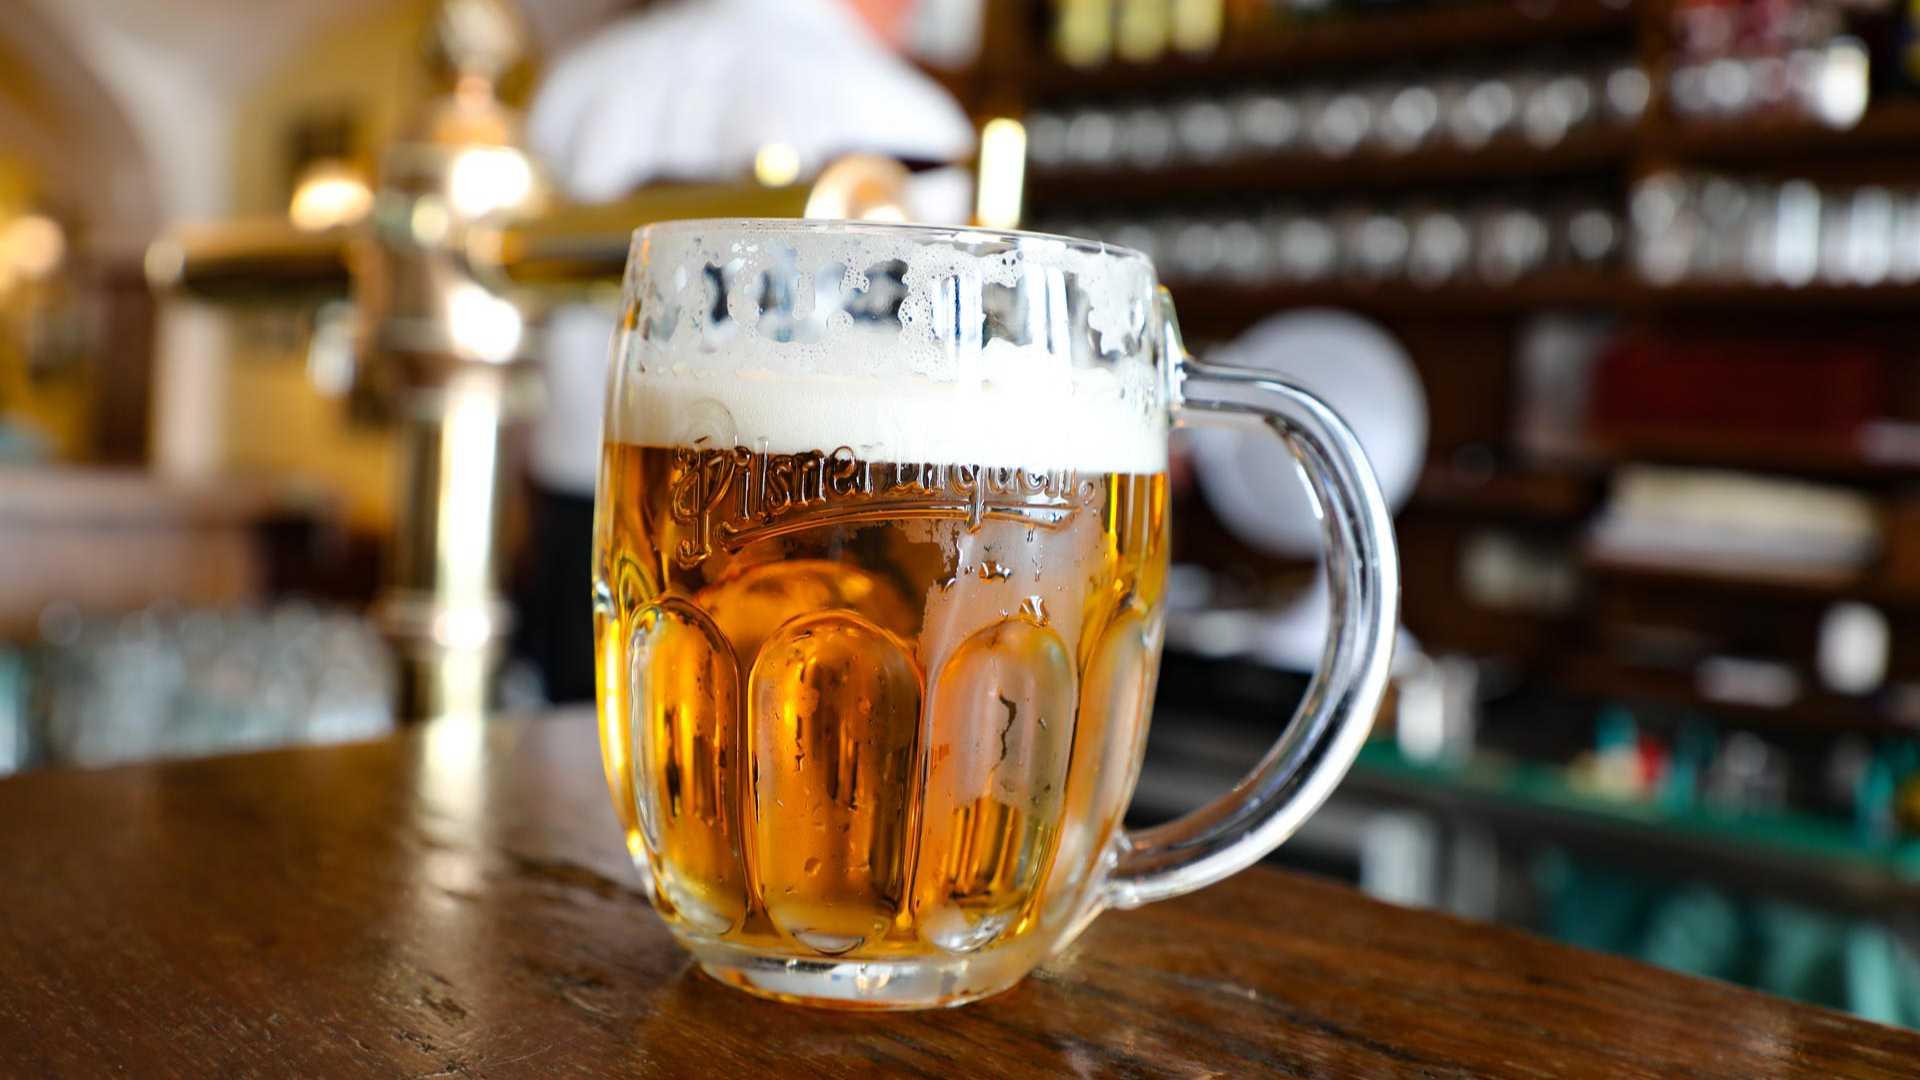 Capítulo 4 – Na vině je pivo (A culpa é da cerveja)